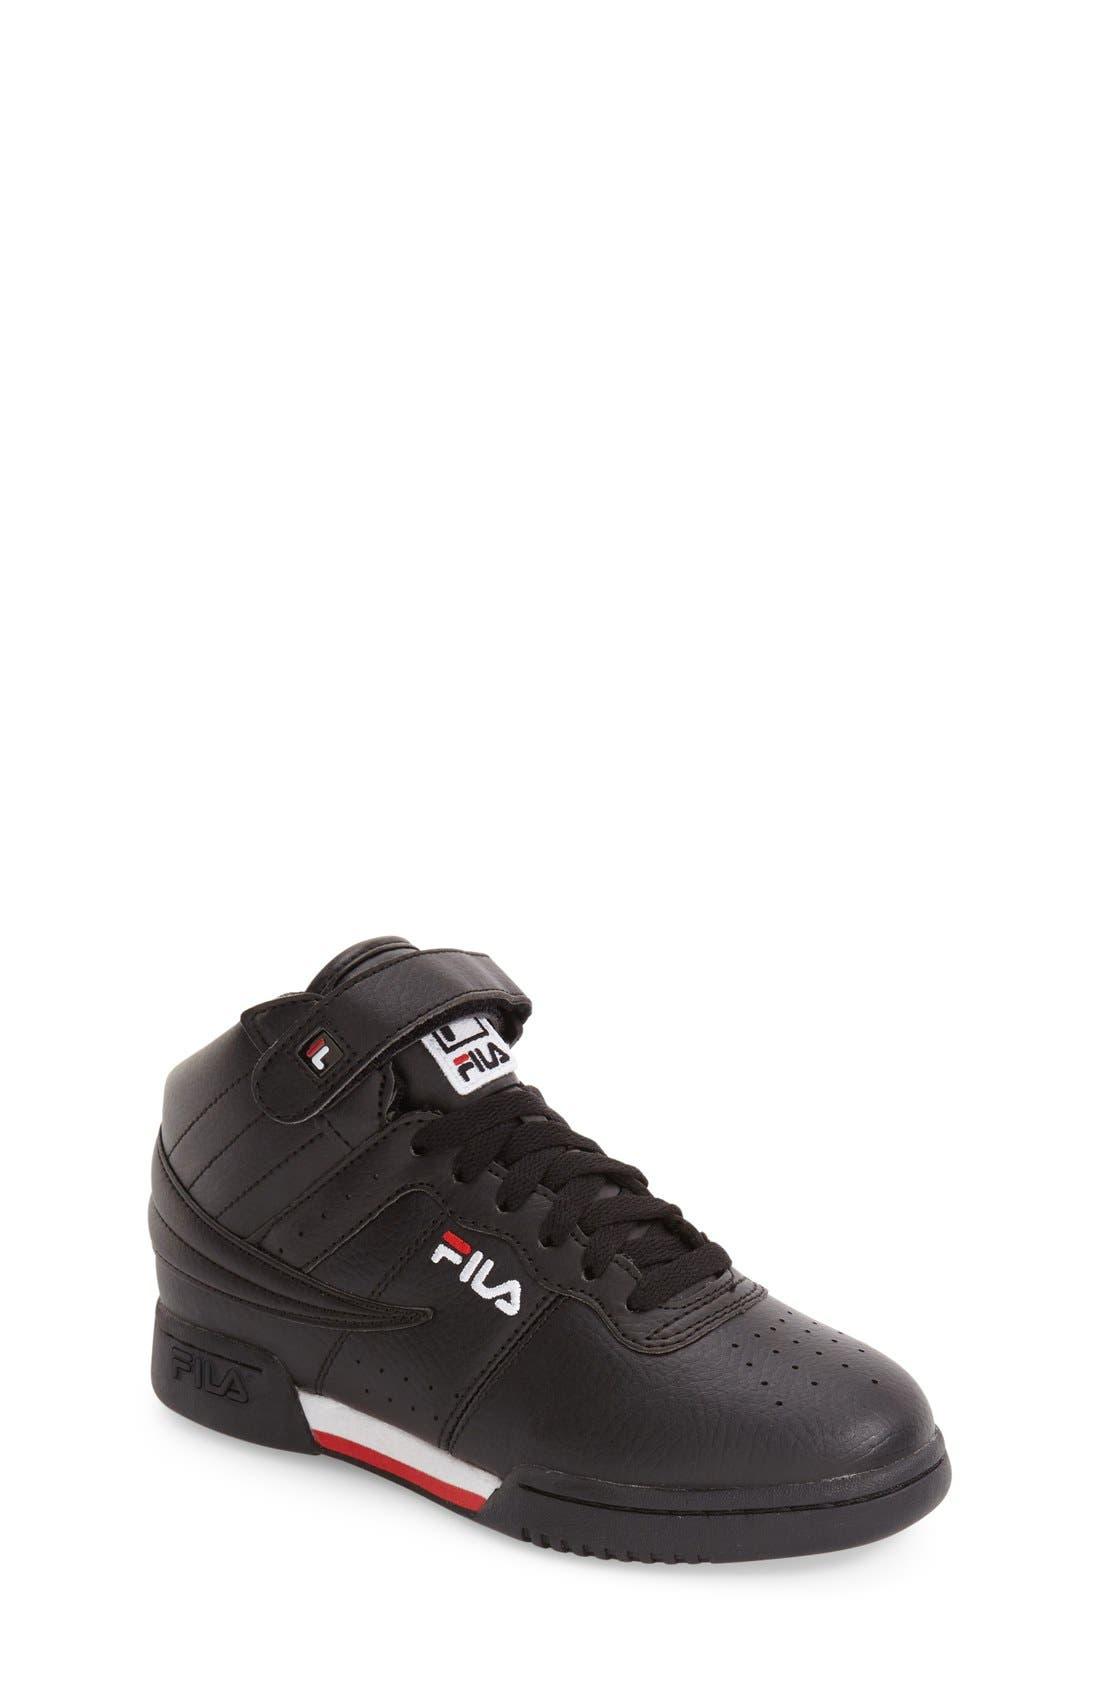 F-13 High Top Sneaker,                             Main thumbnail 1, color,                             001